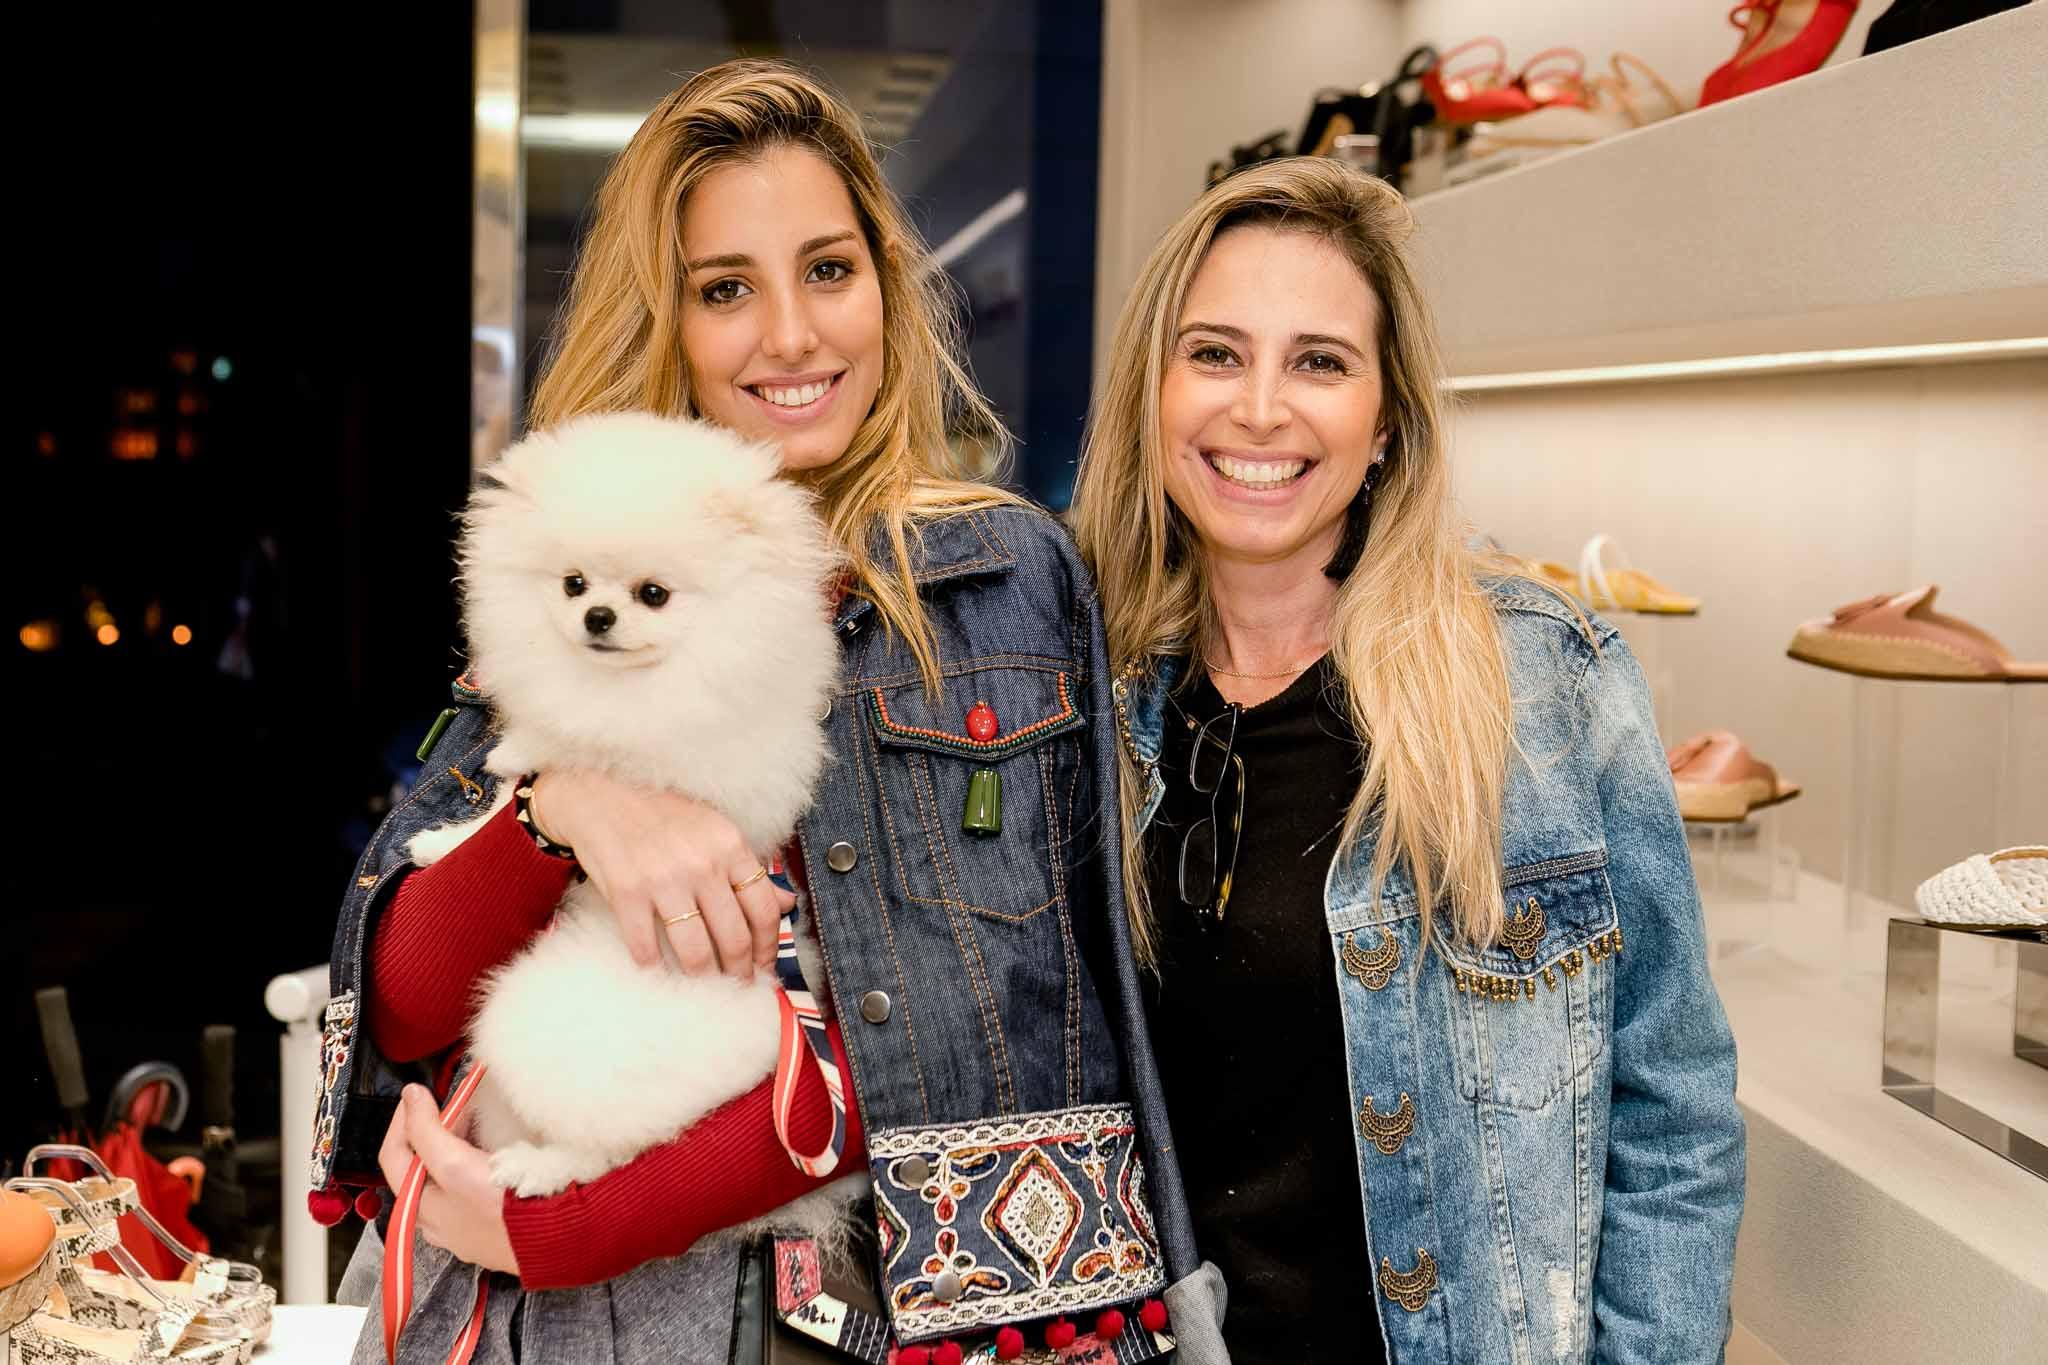 Fernanda di Biase e Viviane di Biase-037